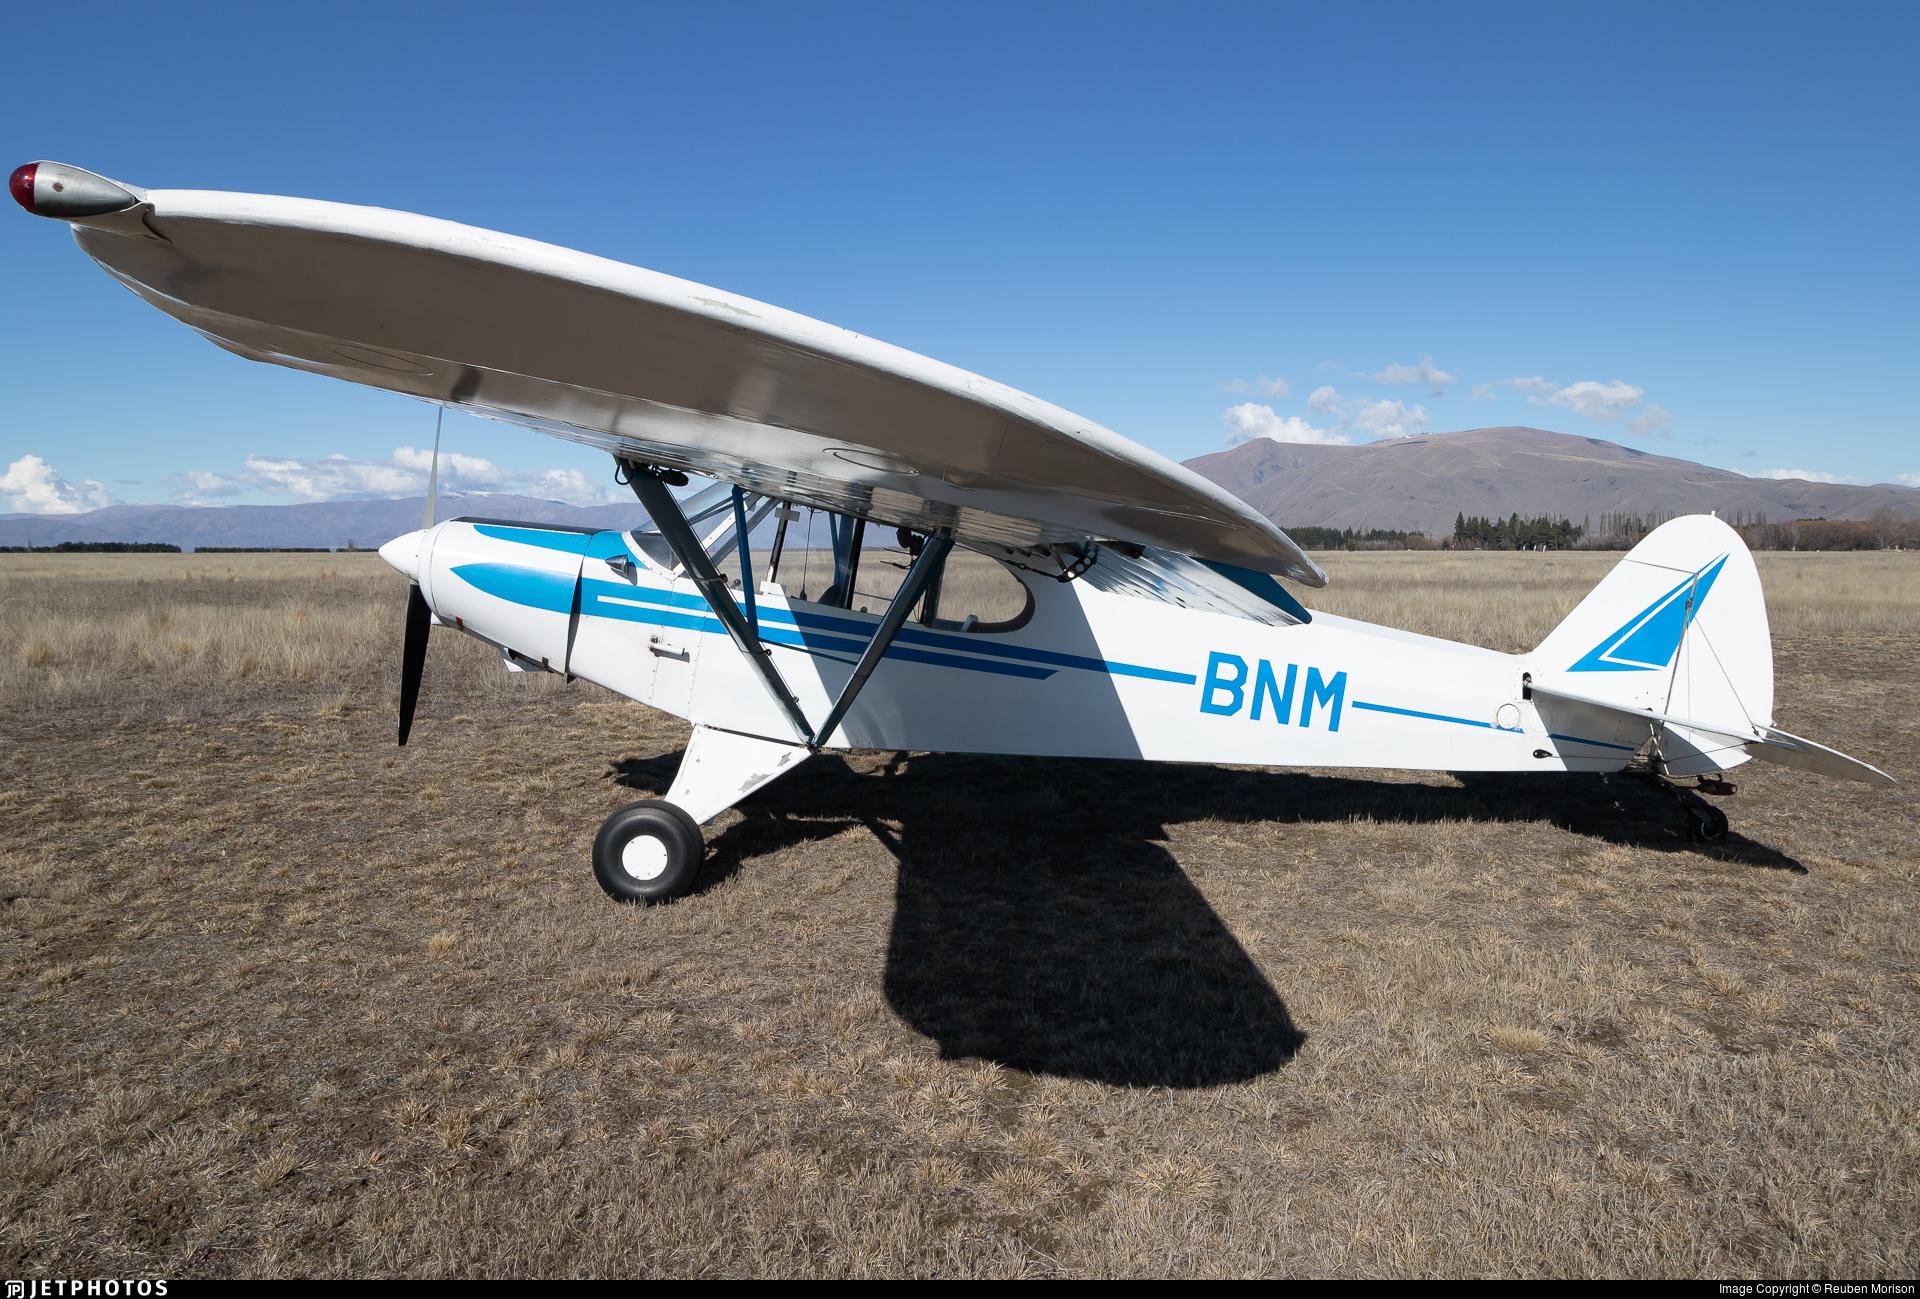 ZK-BNM - Piper PA-18-150 Super Cub - South Canterbury Aero Club